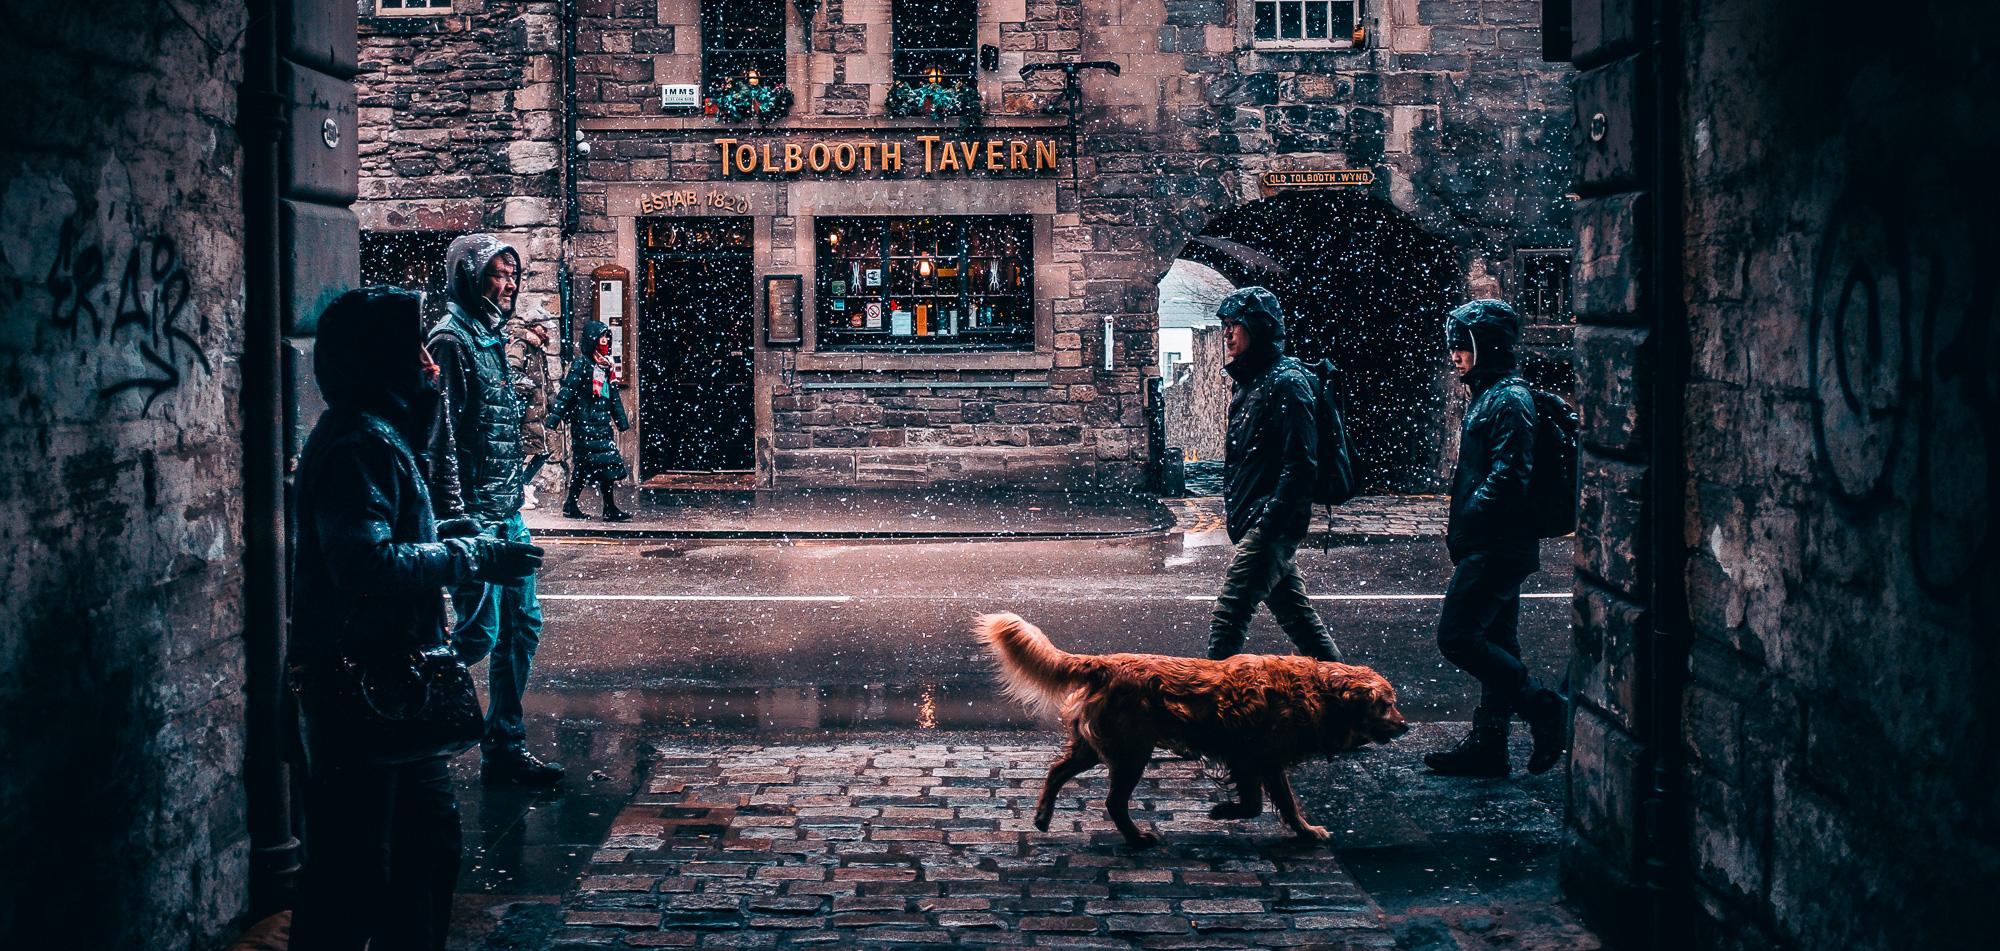 180121_Edinburgh in the Snow - Vlog_068.jpg